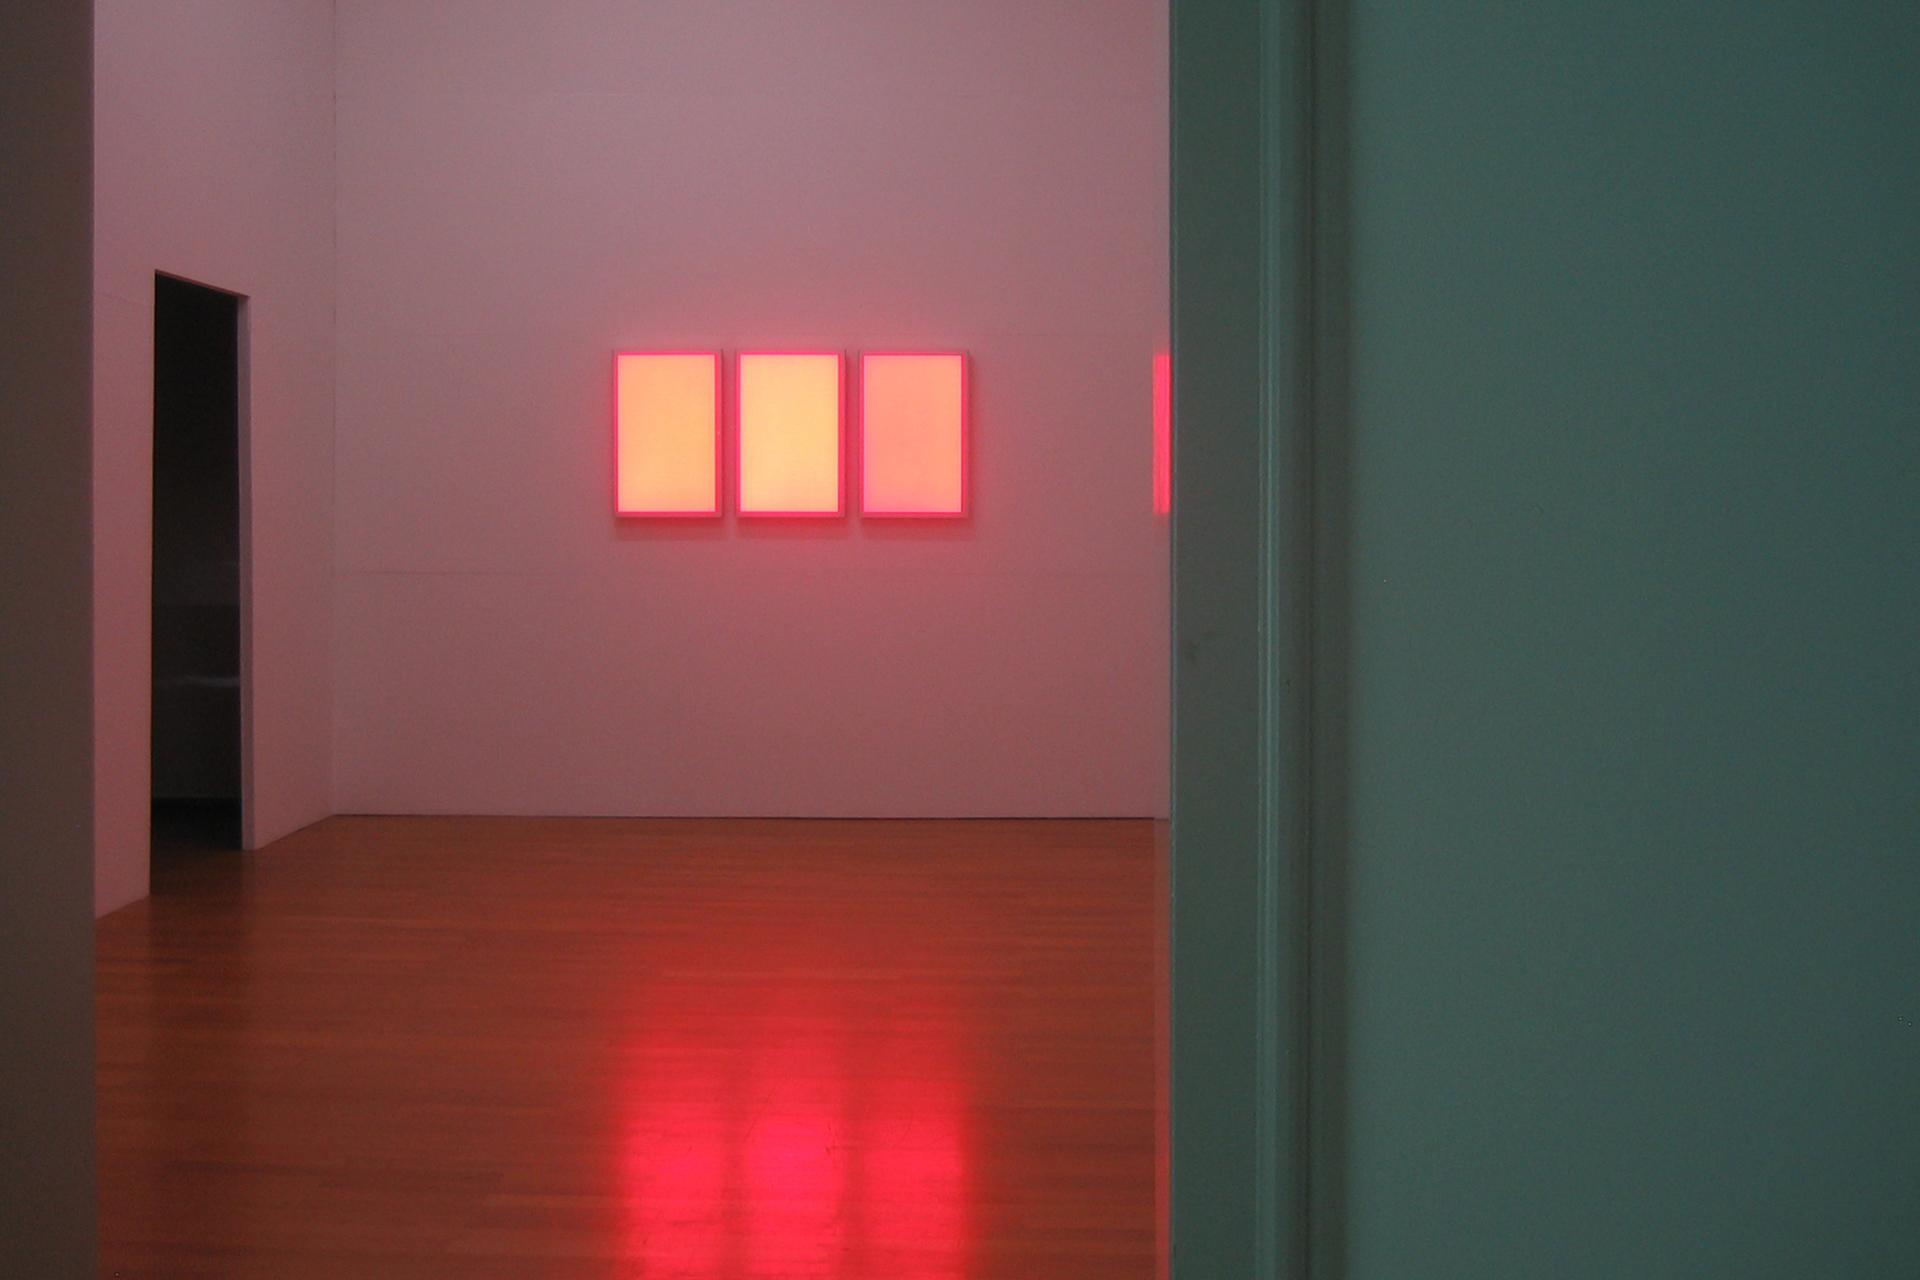 Hito-Steyerl-Kunsthalle-Winterthur-2008-4.jpg